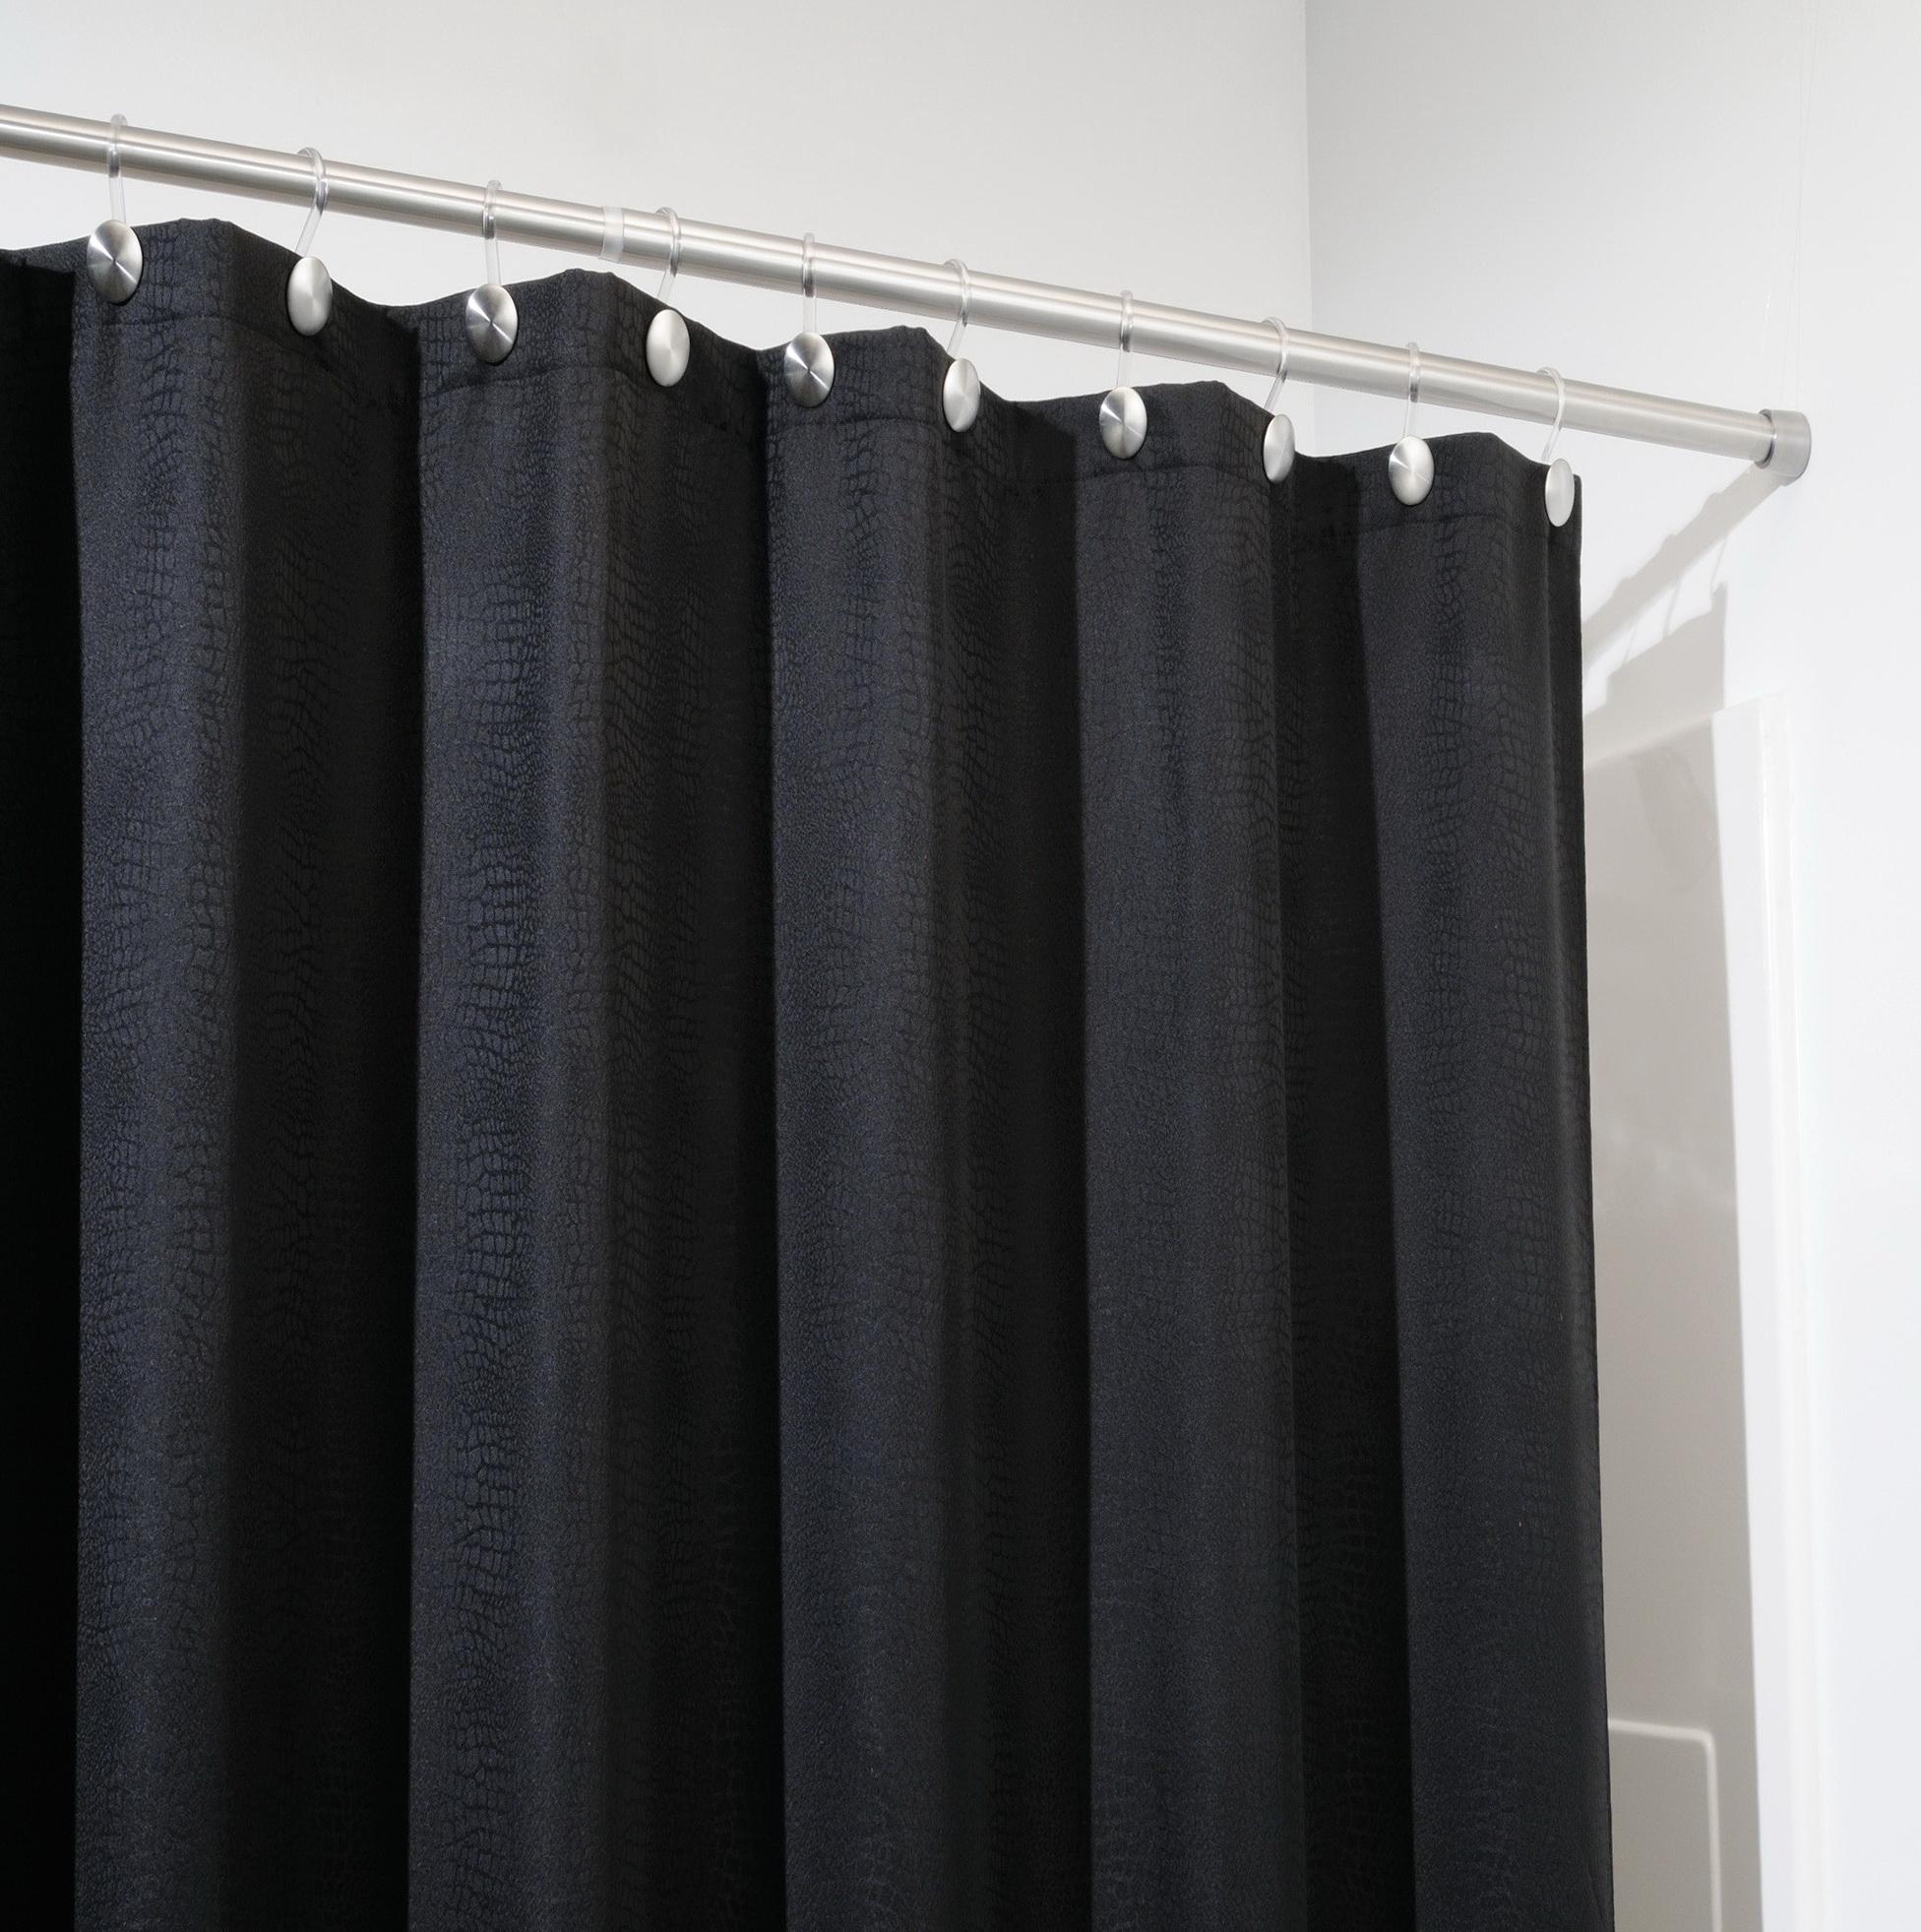 curtain tension rod long home design ideas. Black Bedroom Furniture Sets. Home Design Ideas